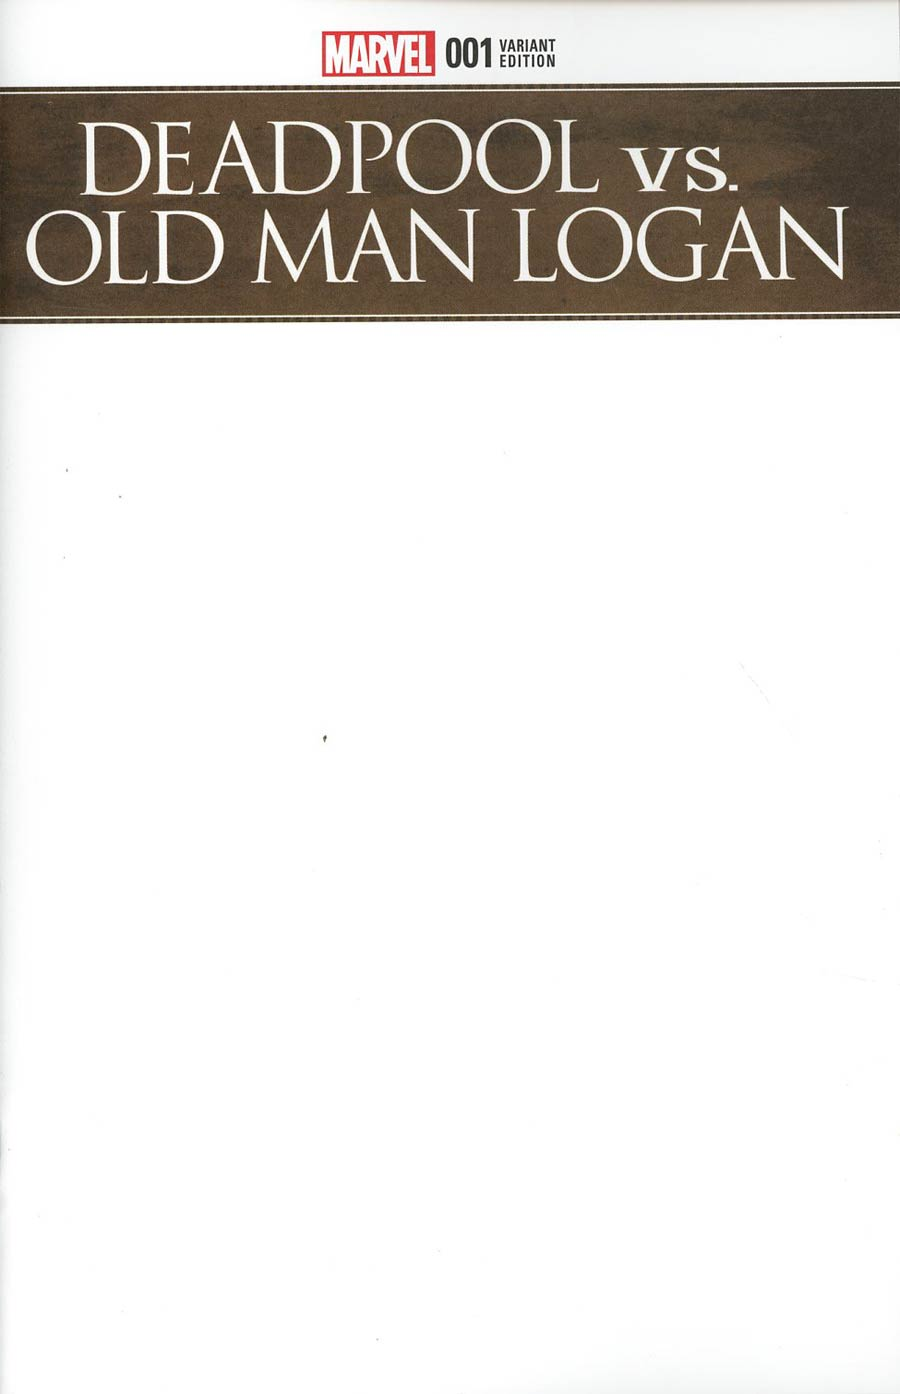 Deadpool vs Old Man Logan #1 Cover C Variant Blank Cover